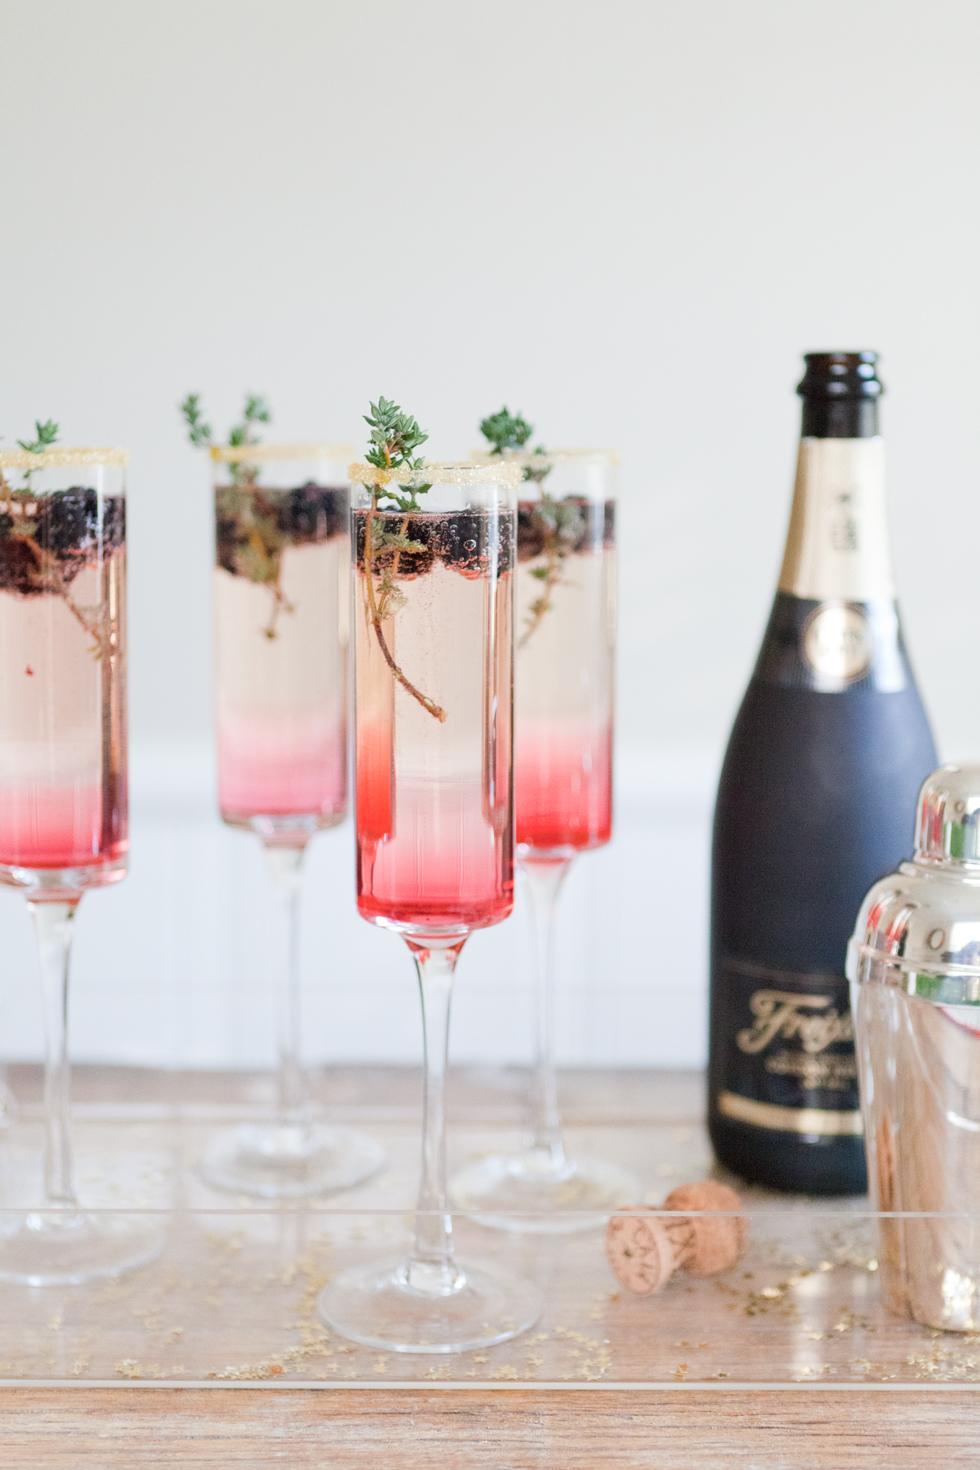 5 коктейлей с шампанским: ежевика и тимьян (рецепт). Photo and recipe by theeffortlesschic.com